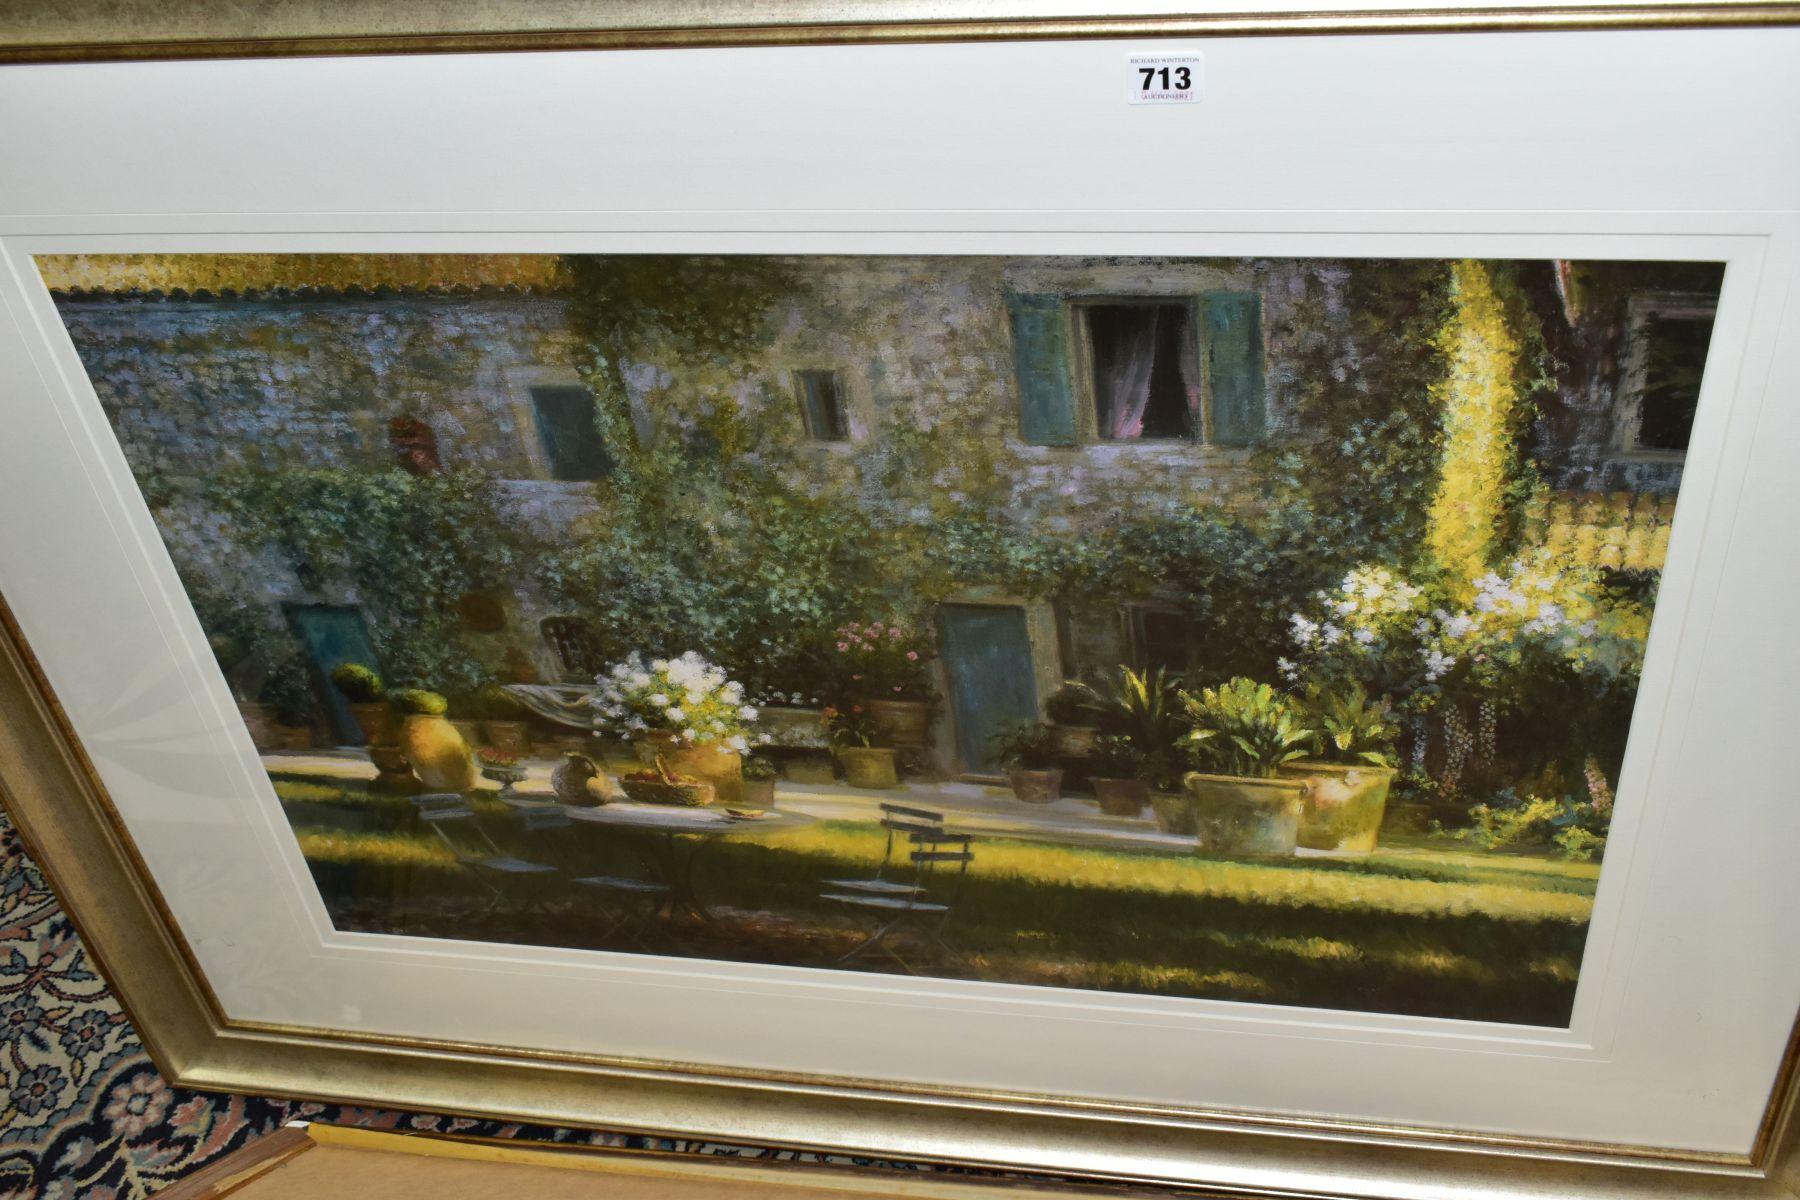 MODERN DECORATIVE PRINTS, ETC, comprising Greg Singley 'Calzione Al Fresco', an Italian rustic - Image 3 of 3